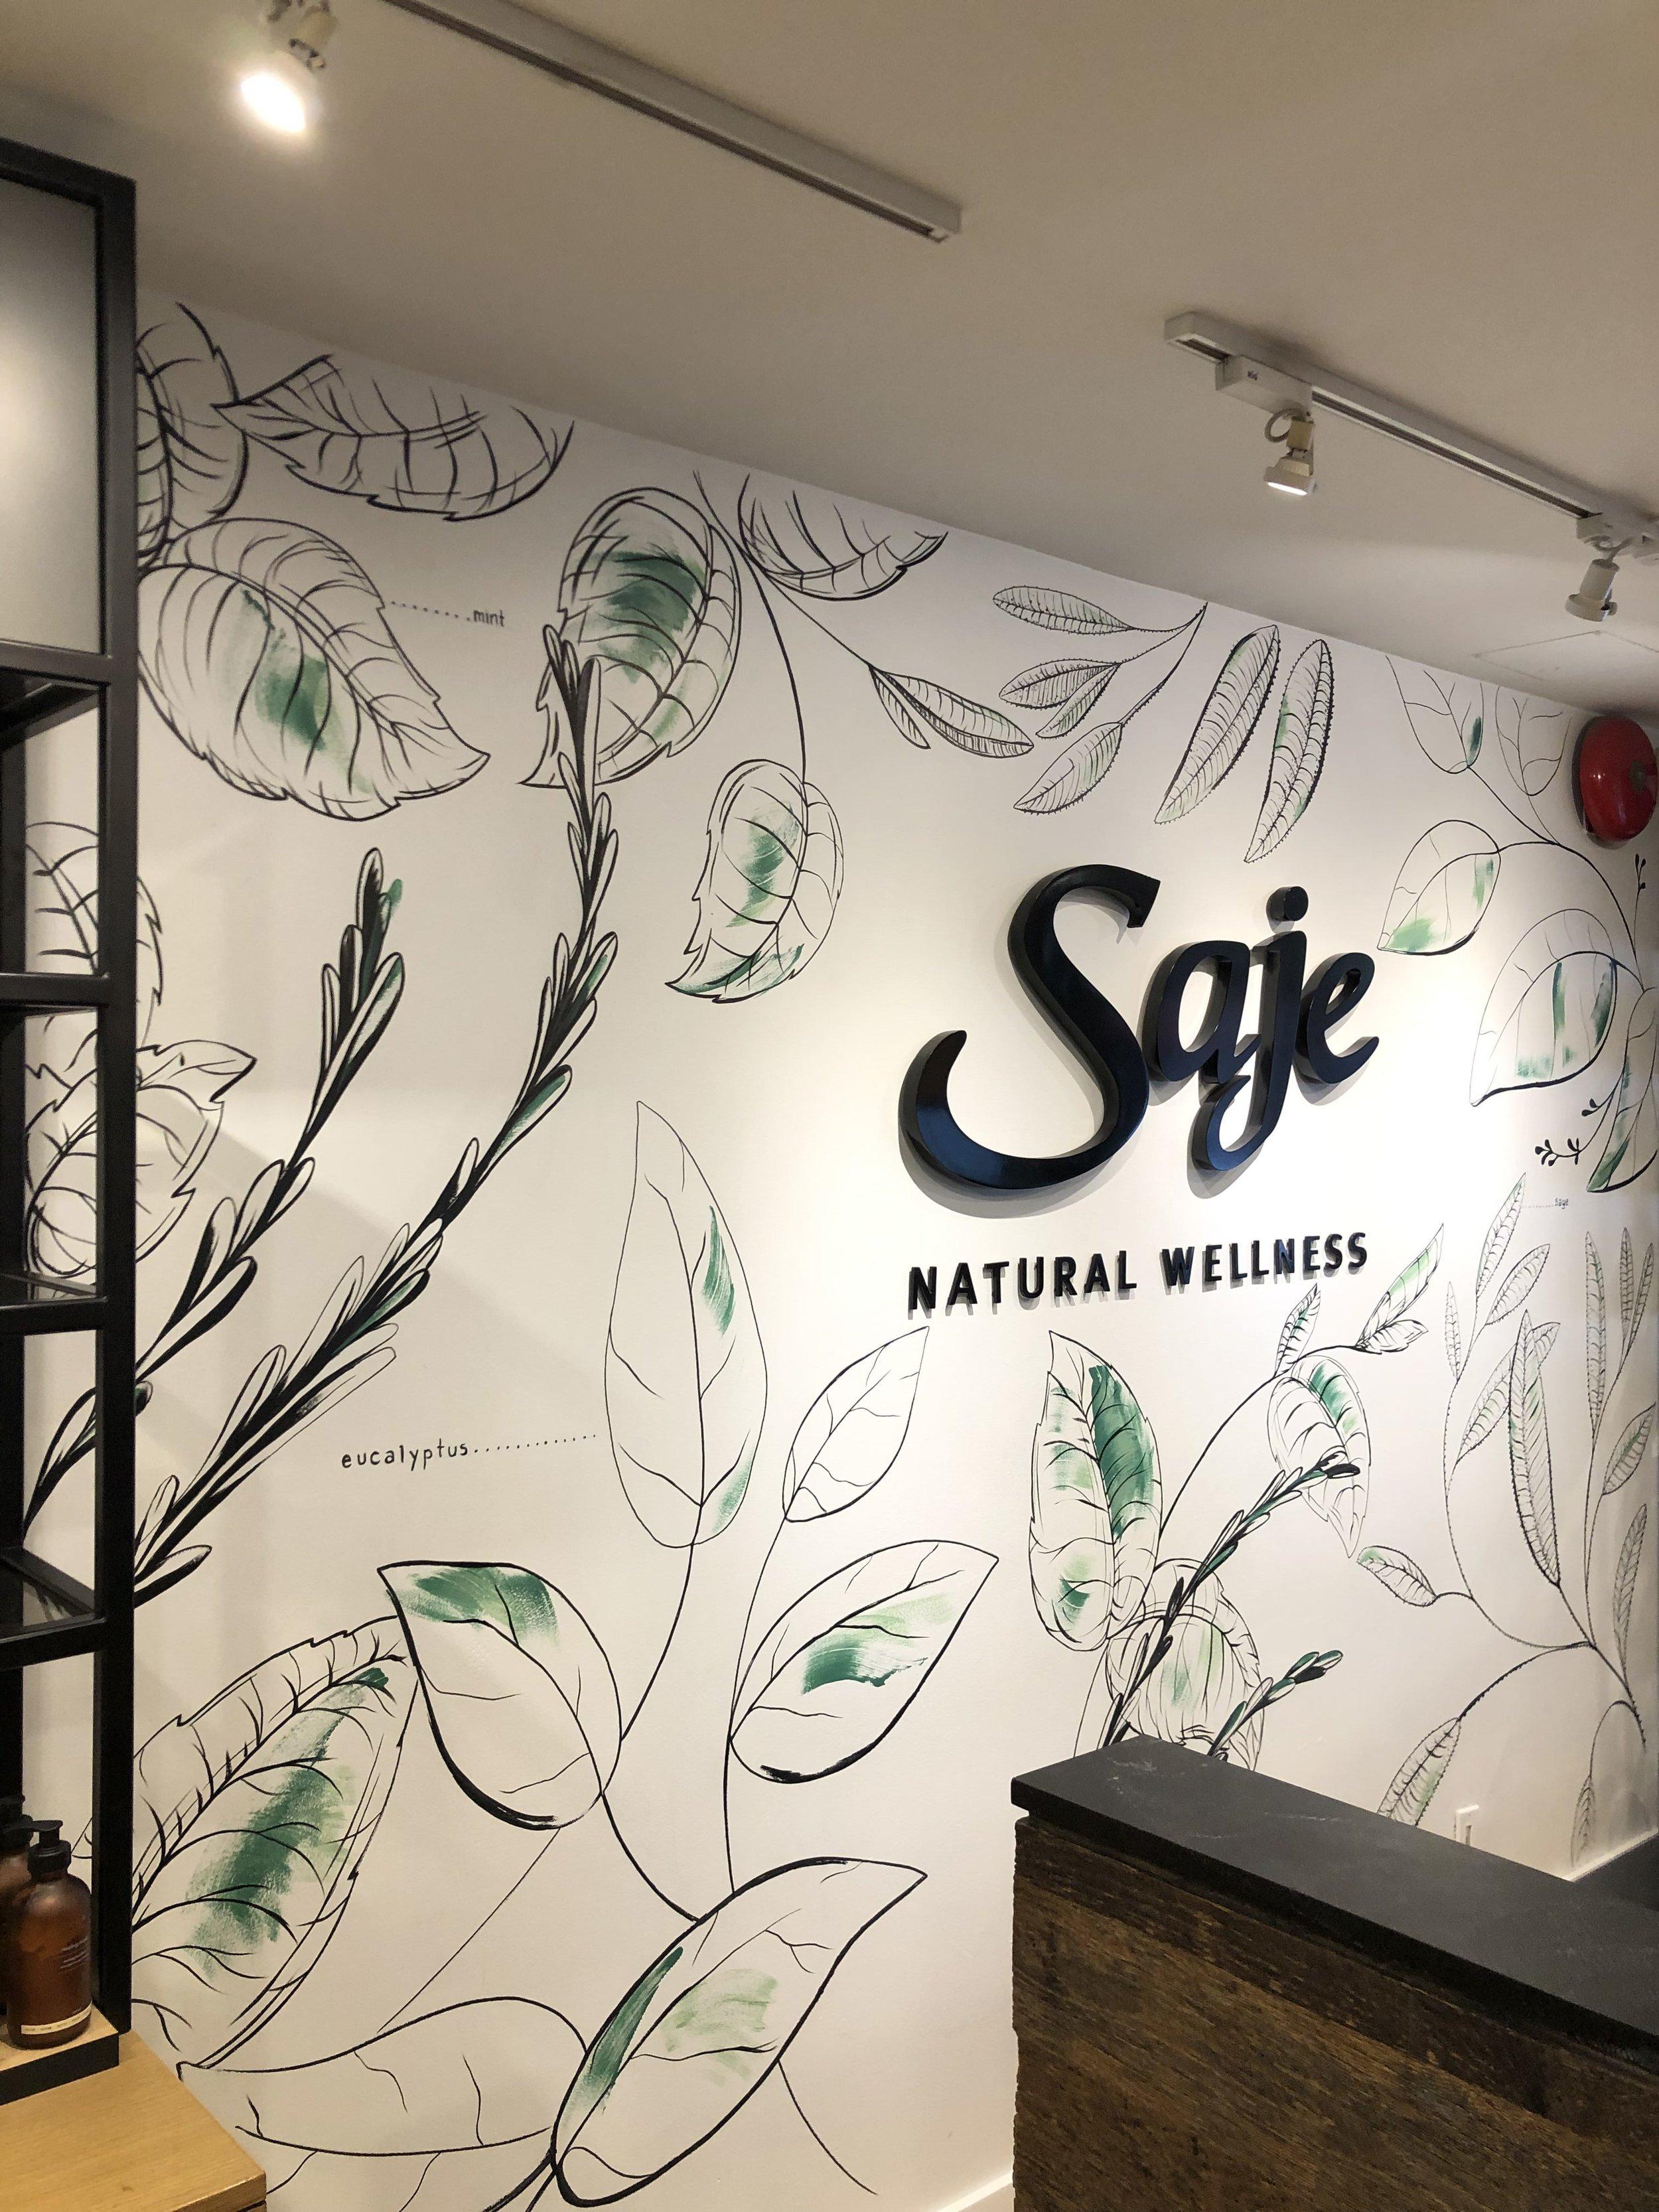 Mural for Saje Natural Wellness, Kitsilano Vancouver